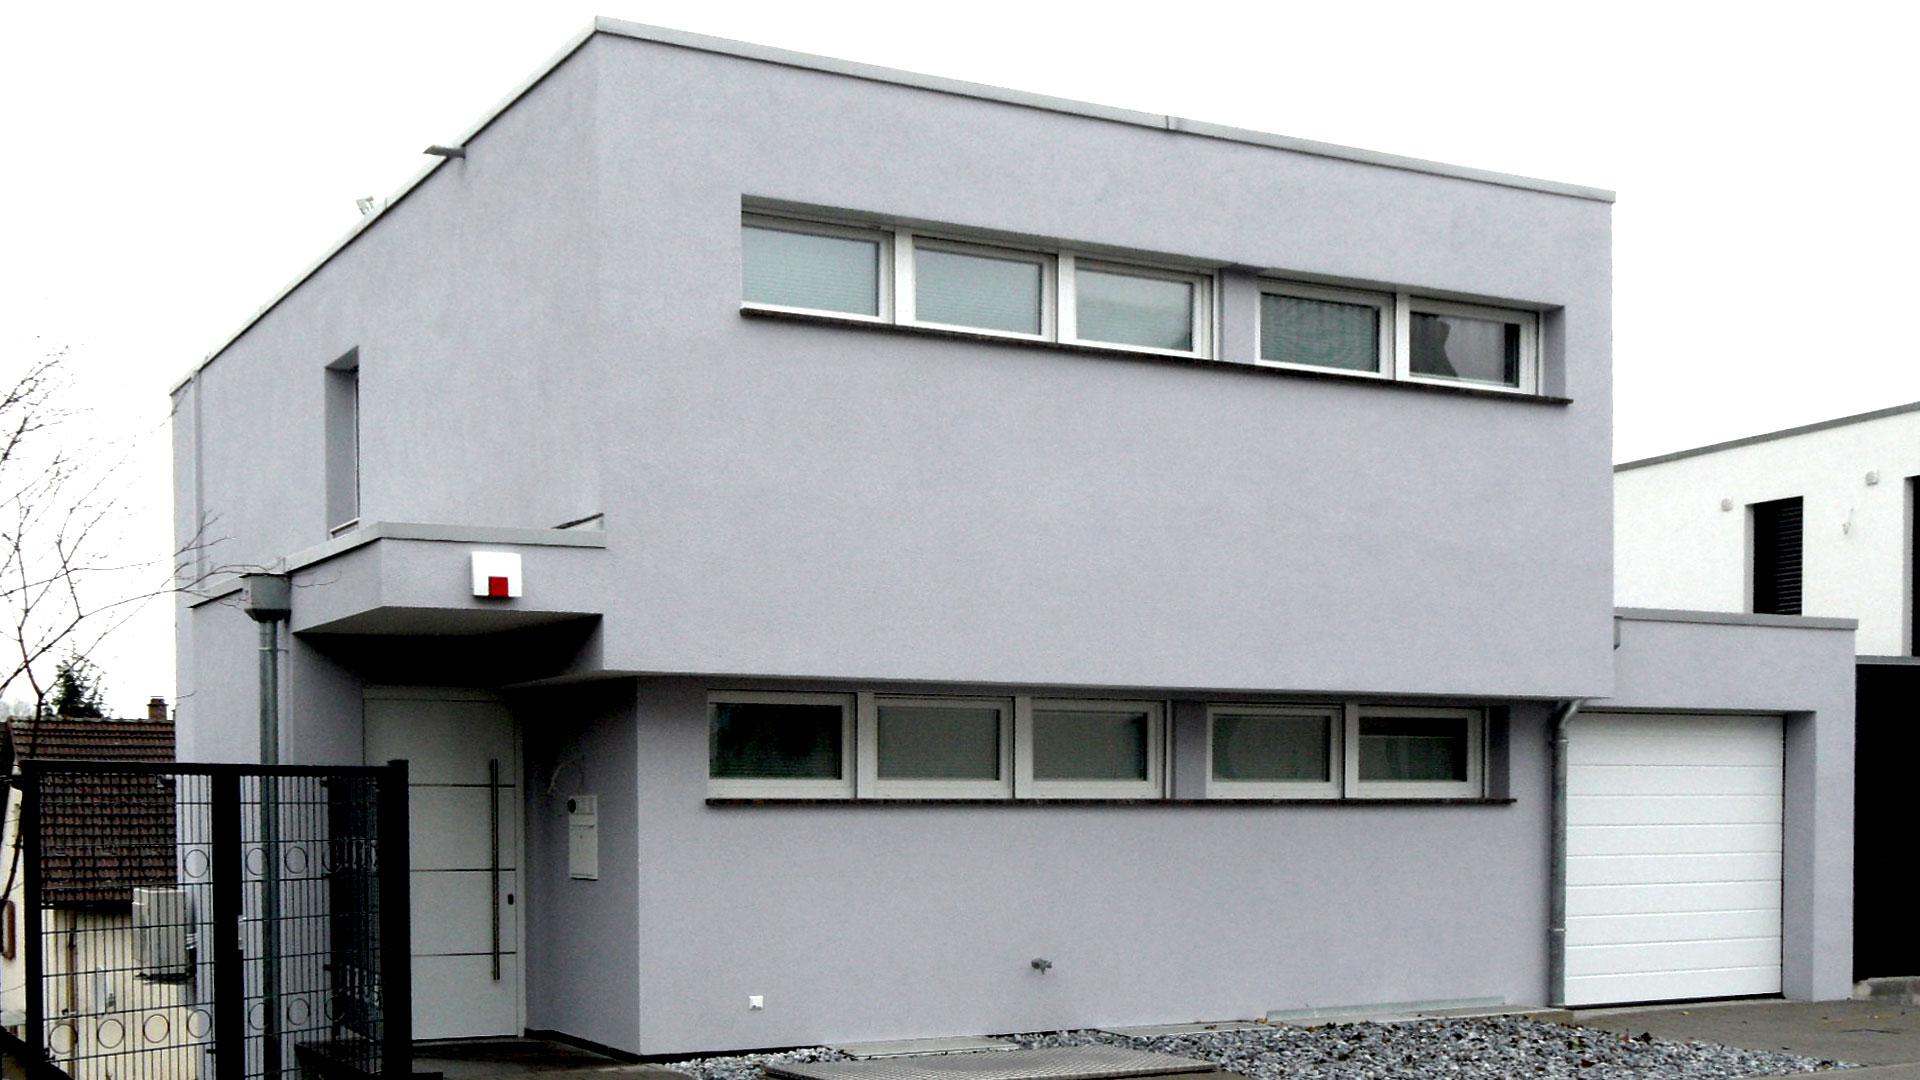 Neubau Einfamilienhaus am Steilhang